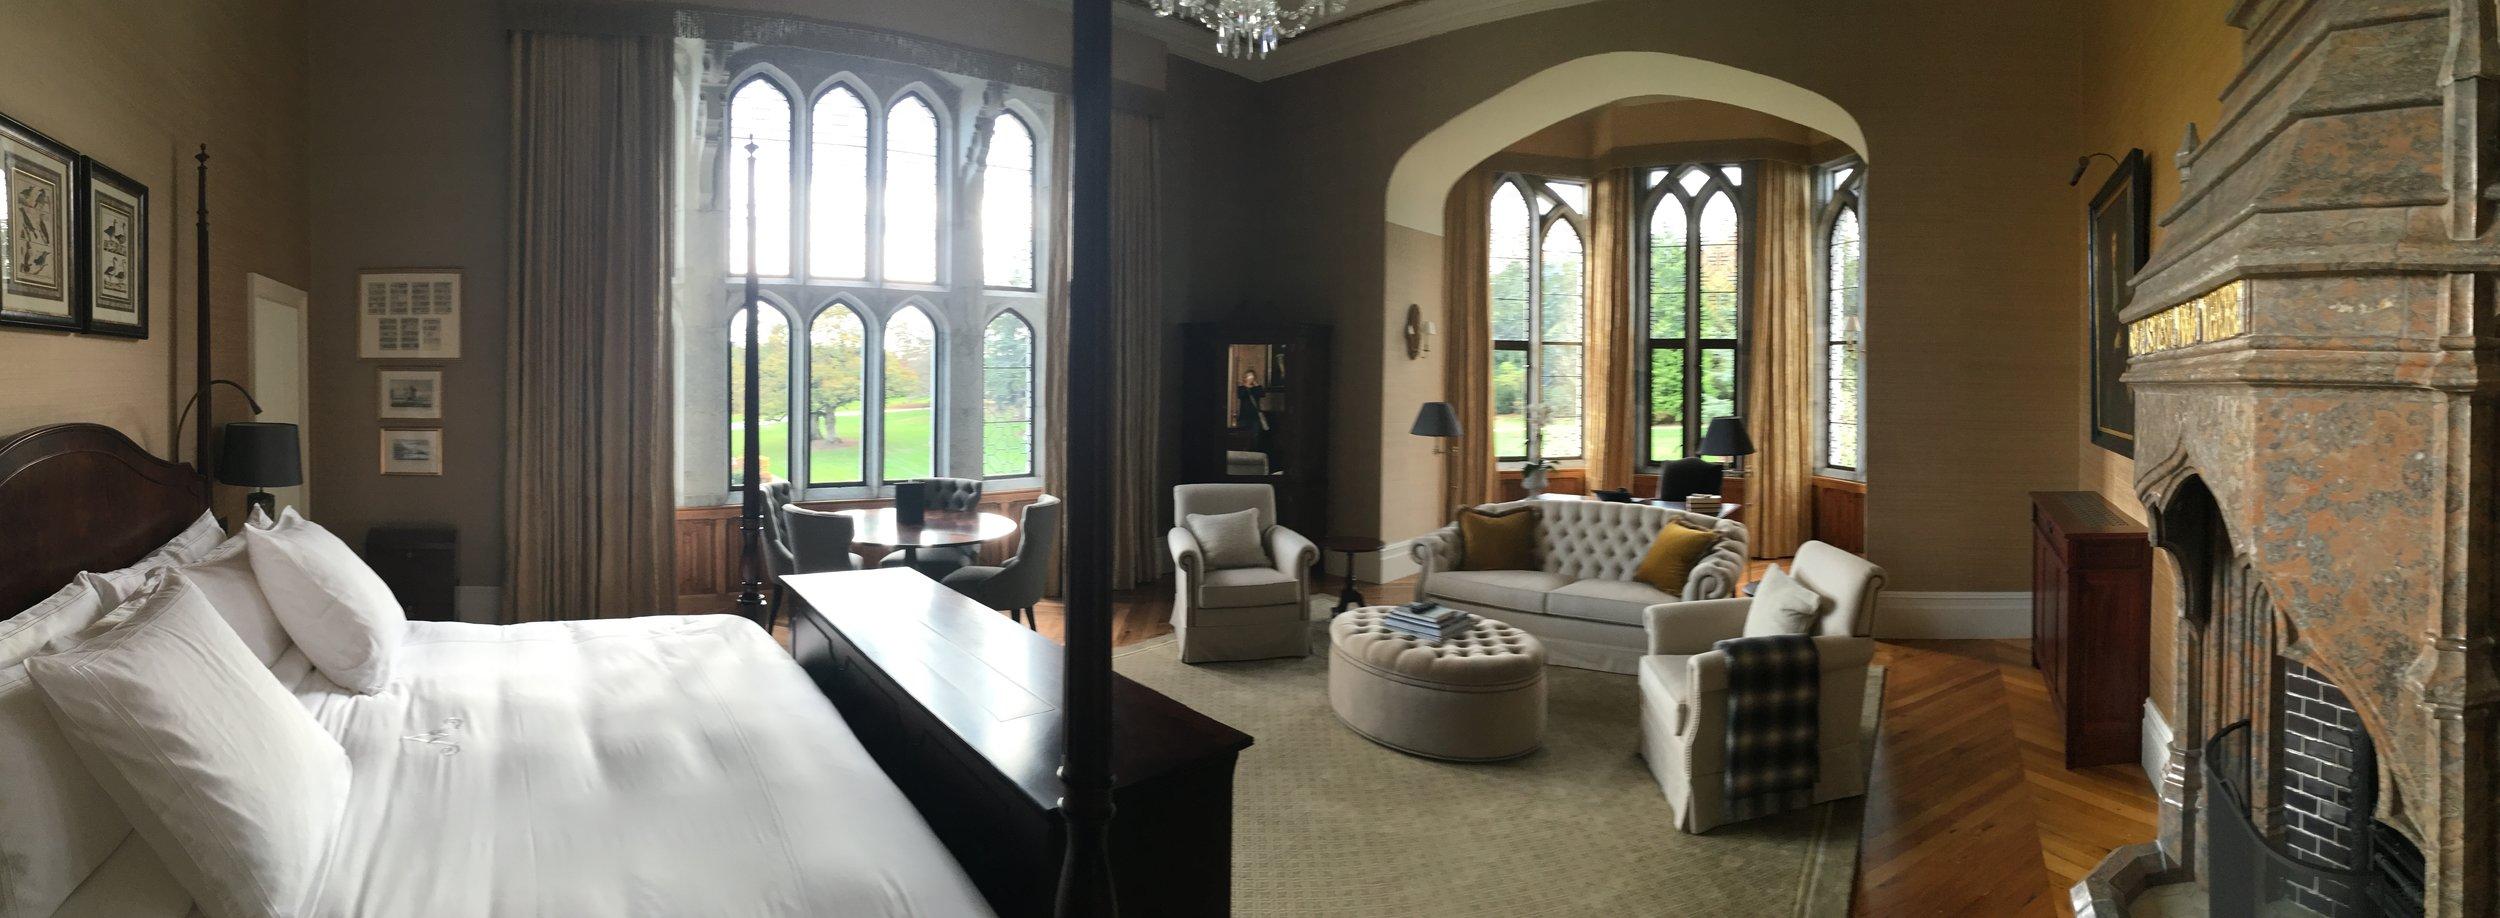 Wanderlust-blog-Adare-Manor-Ireland-luxury-room